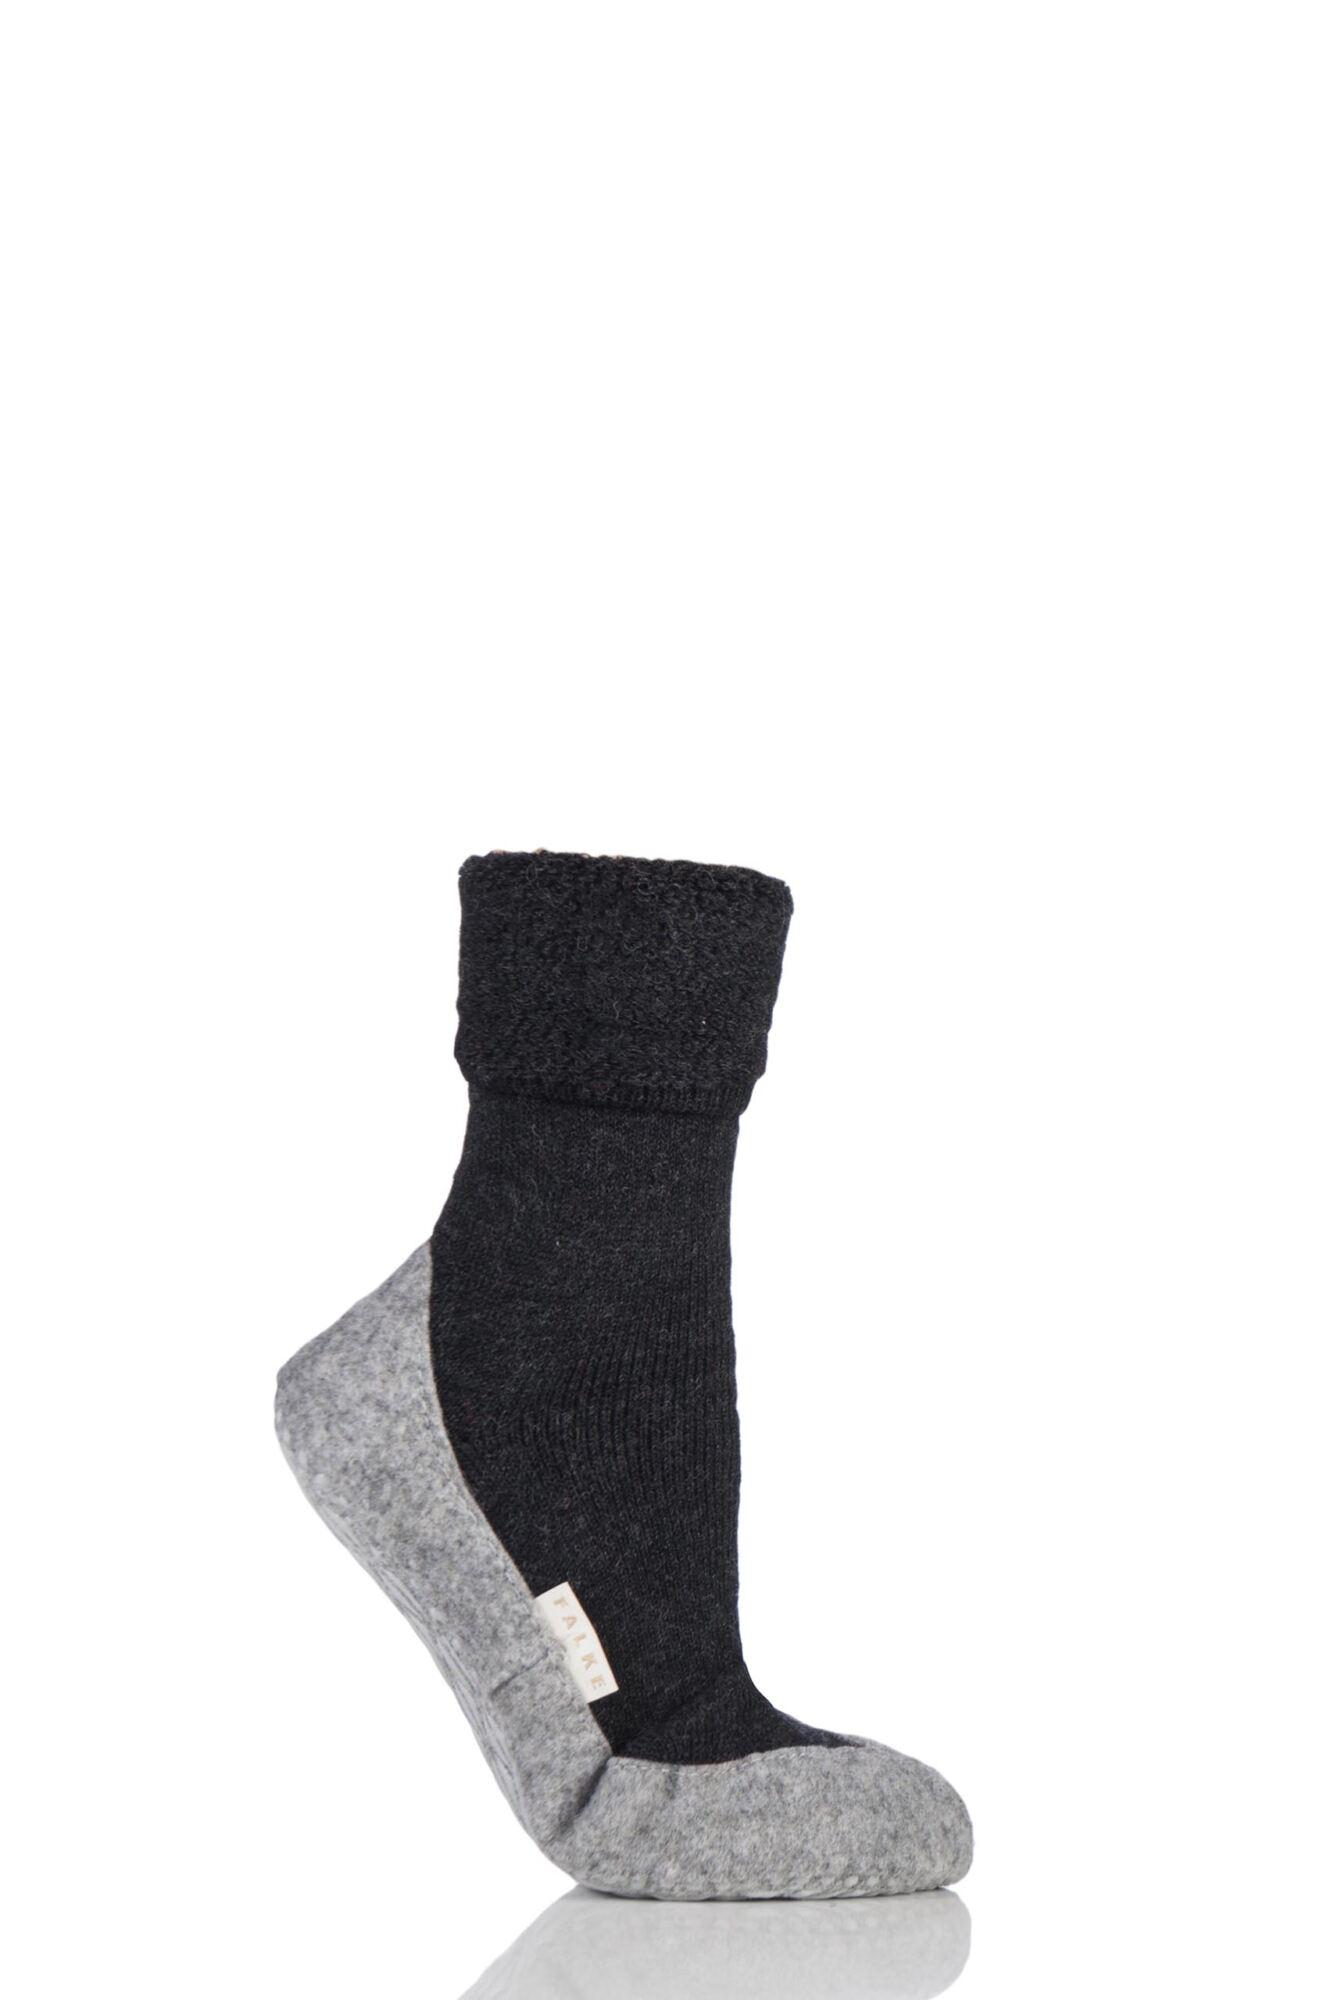 1 Pair CosyShoe Slipper House Socks Ladies - Falke